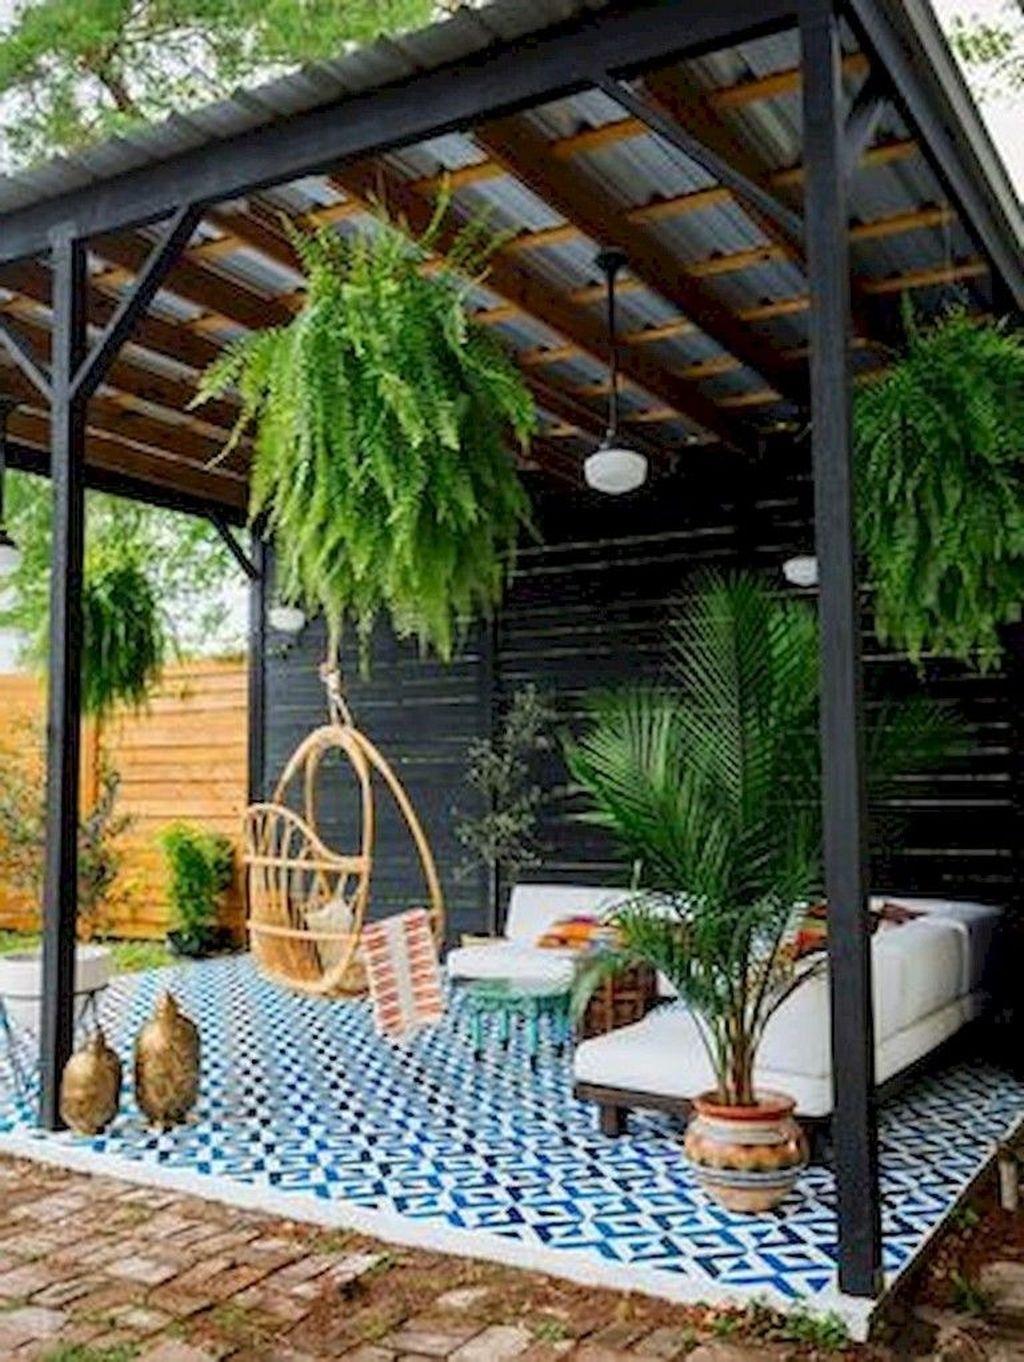 42 Brilliant Small Backyard Design Ideas On A Budget ... on Pool Patio Ideas On A Budget id=42499